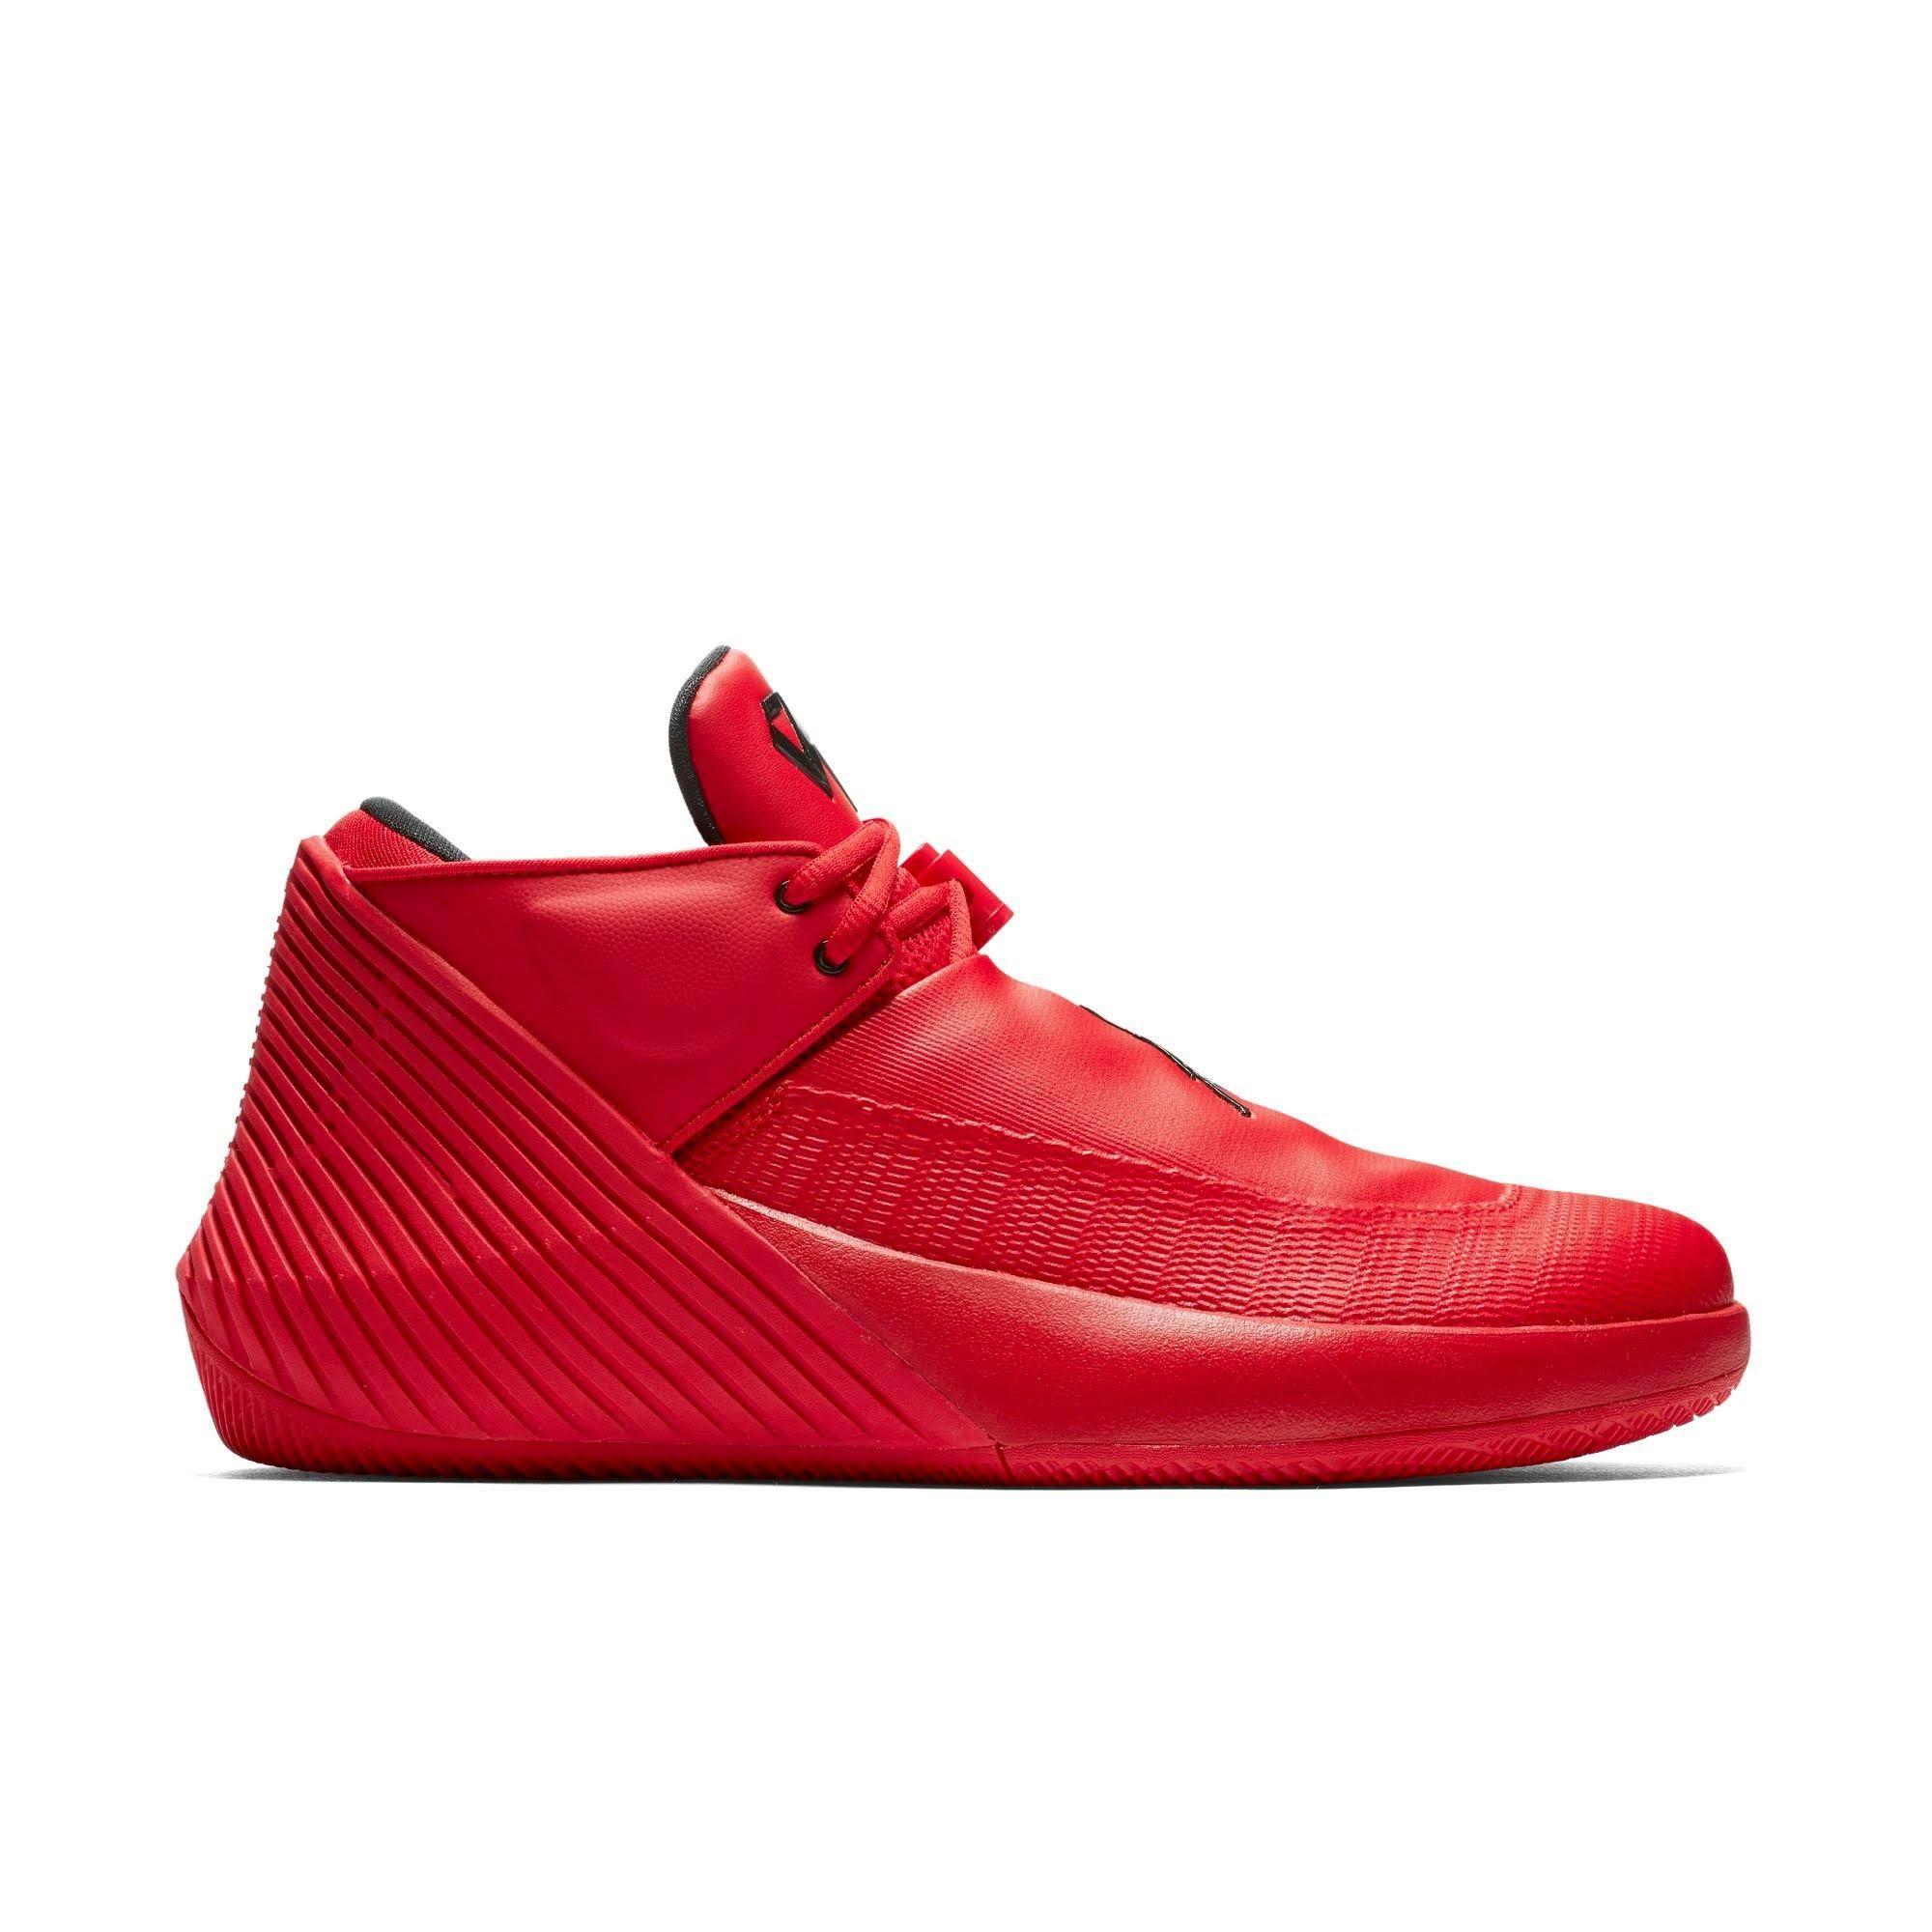 10 Not 1 Jordan Zapatos 5 Zero Why University Red Low Hombre HZz5q1wzx